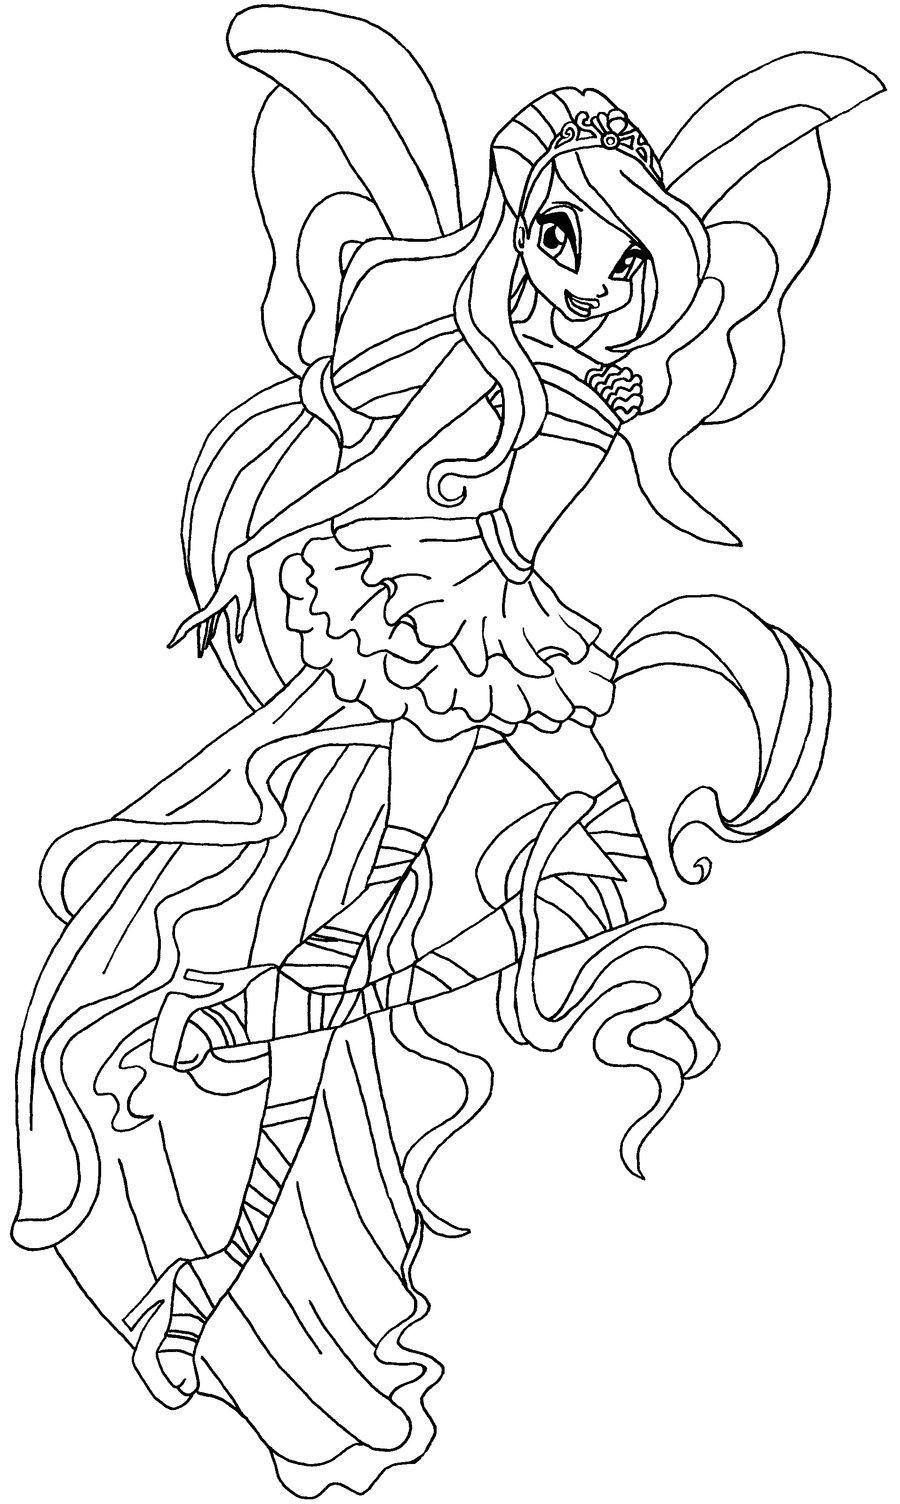 51 Coloriage Mandala Winx Imprimer Mermaid Coloring Pages Fairy Coloring Pages Coloring Pages